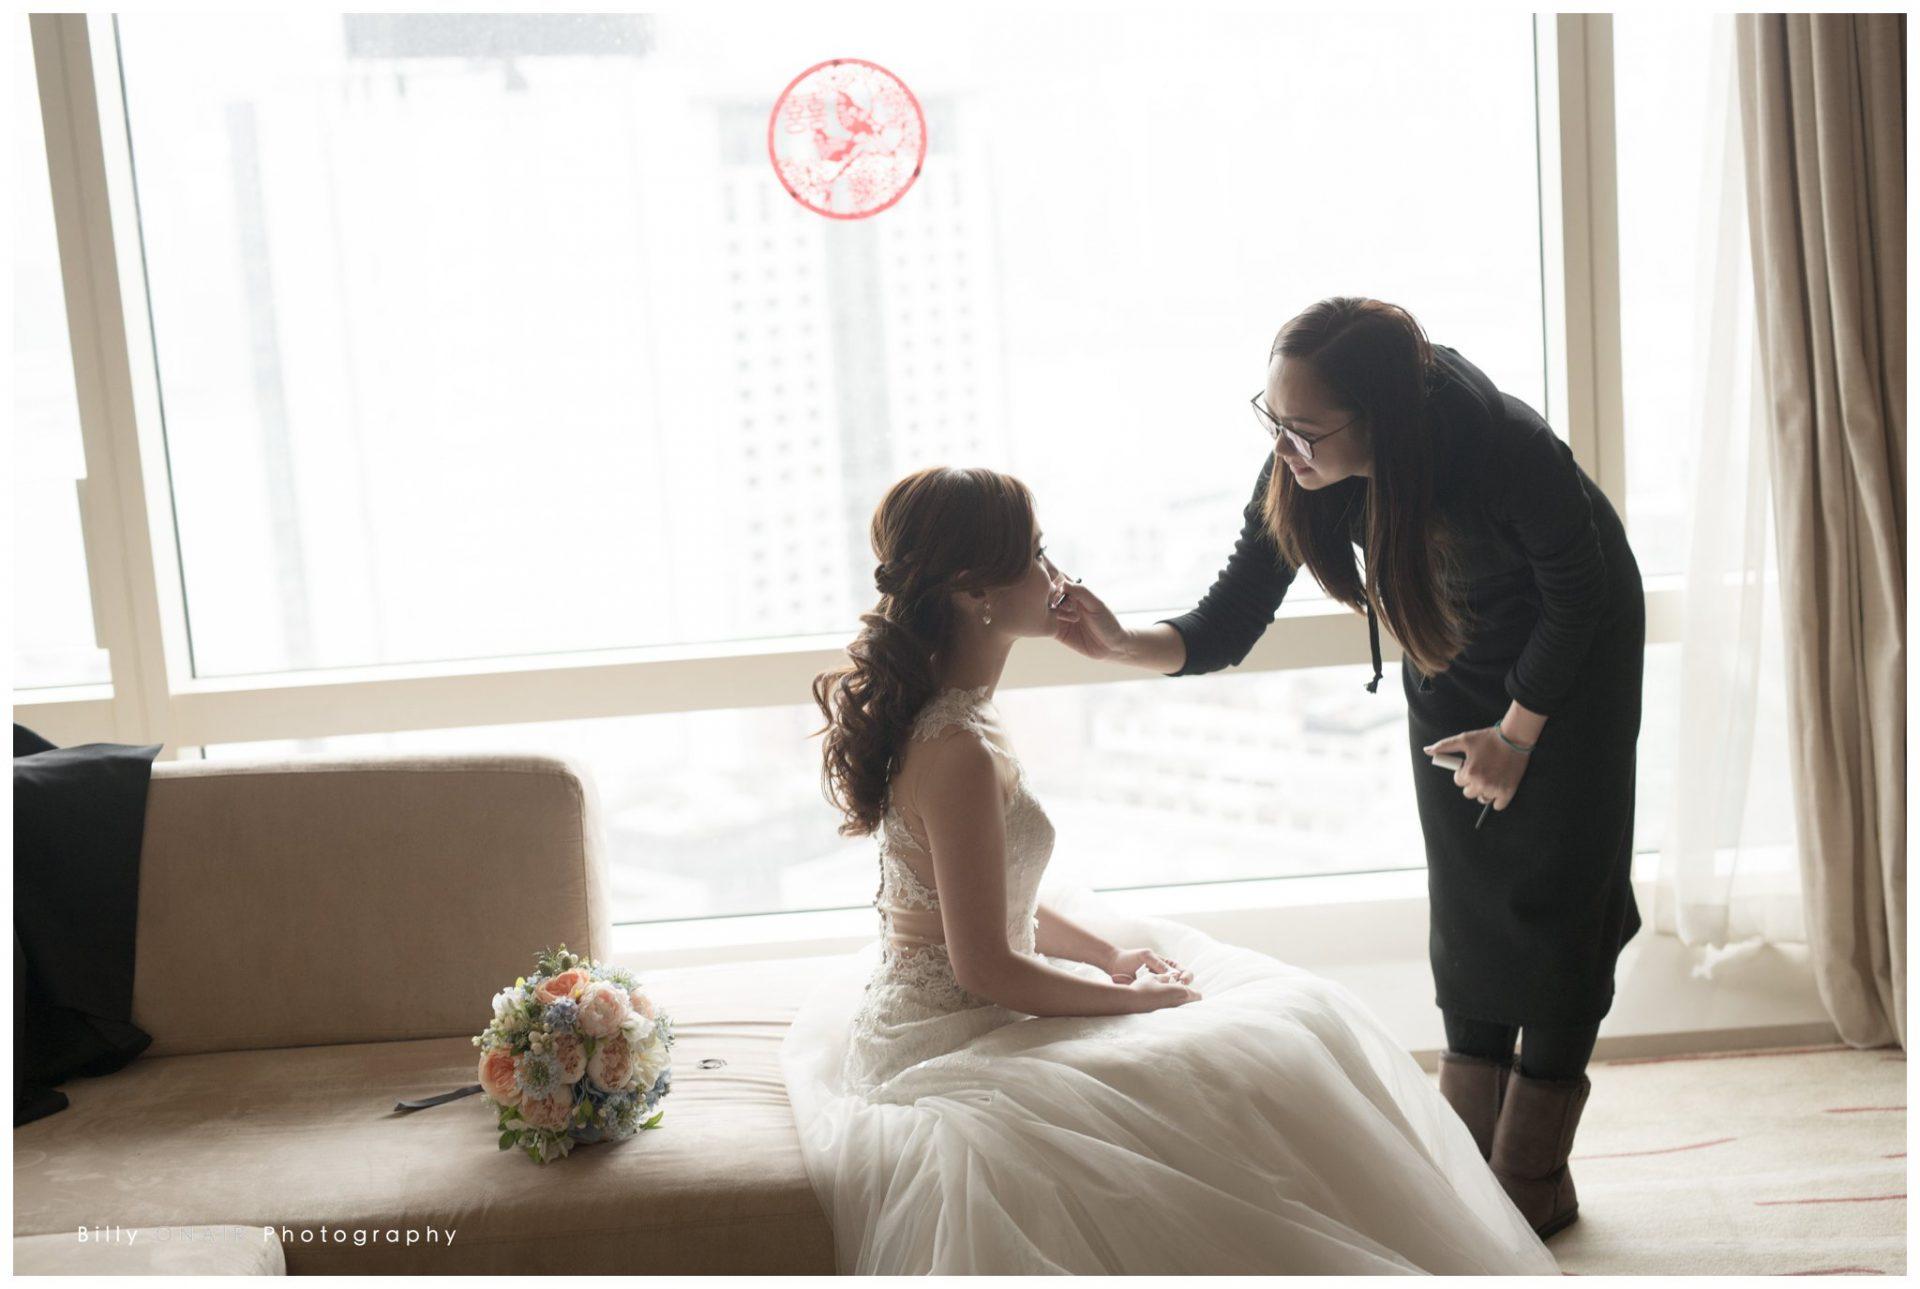 billy_wedding_photography_017